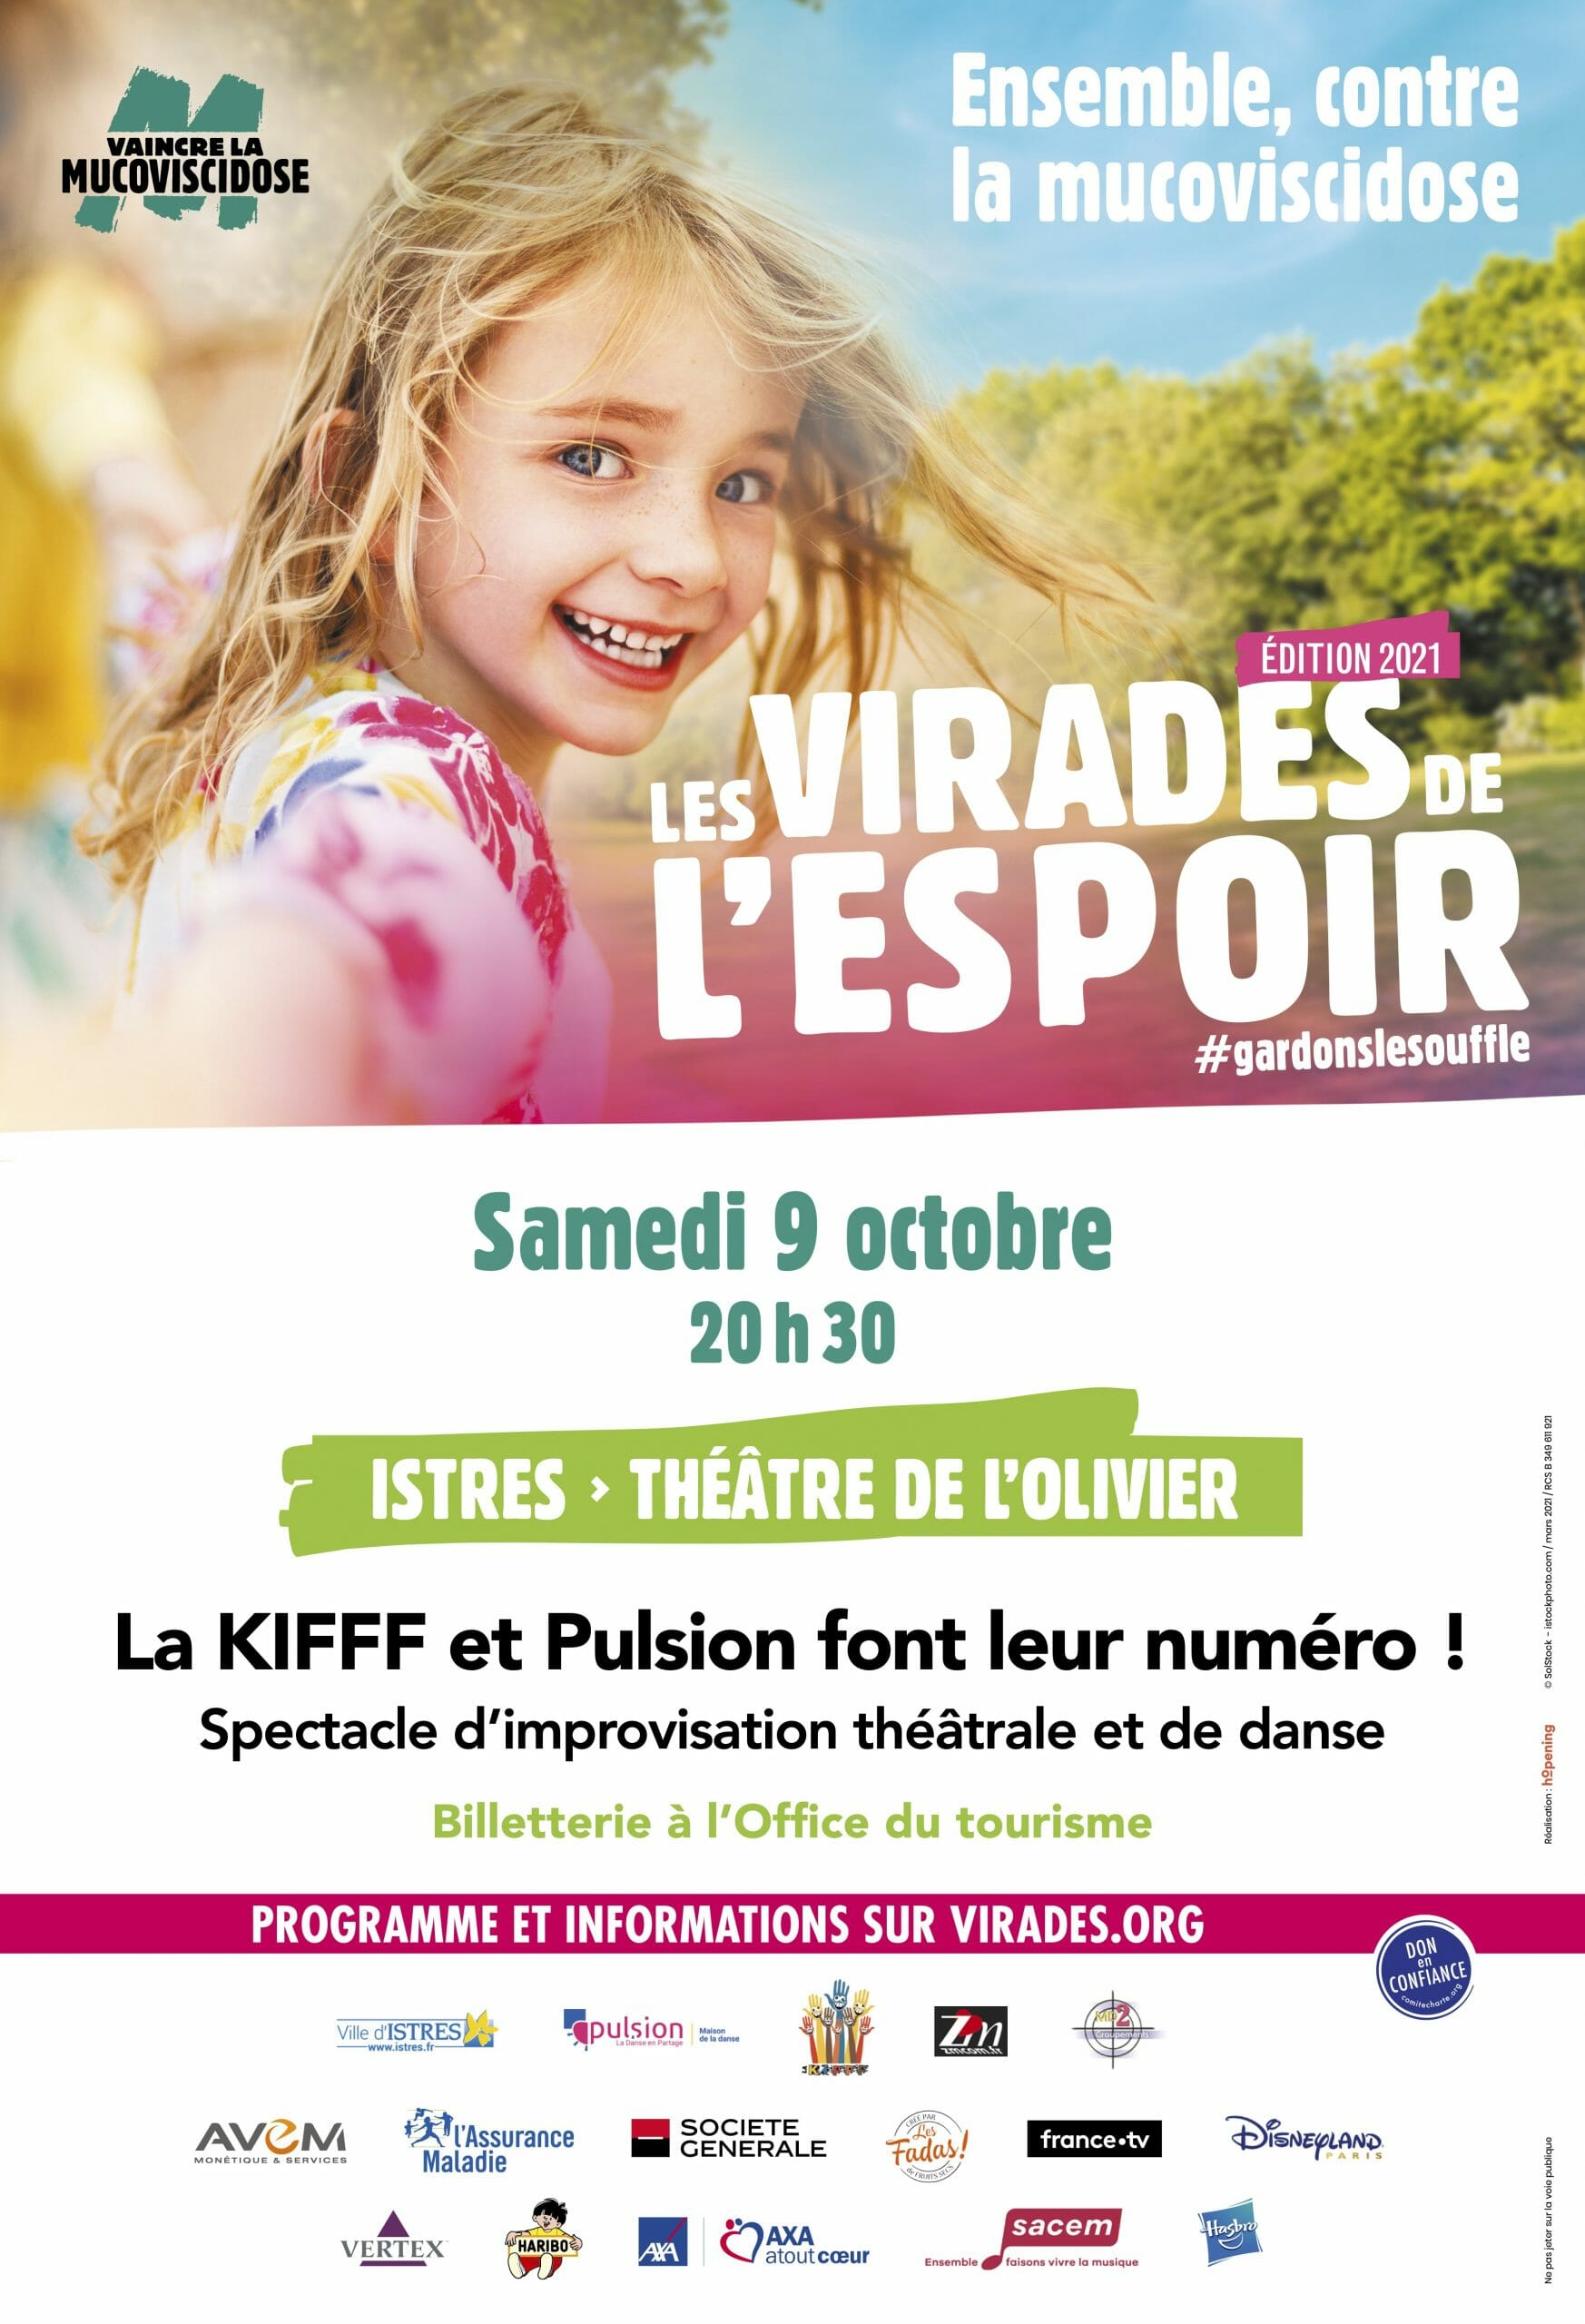 La Kifff - Improvisation istres - virades - espoir - mucoviscidose - théâtre - danse - pulsion